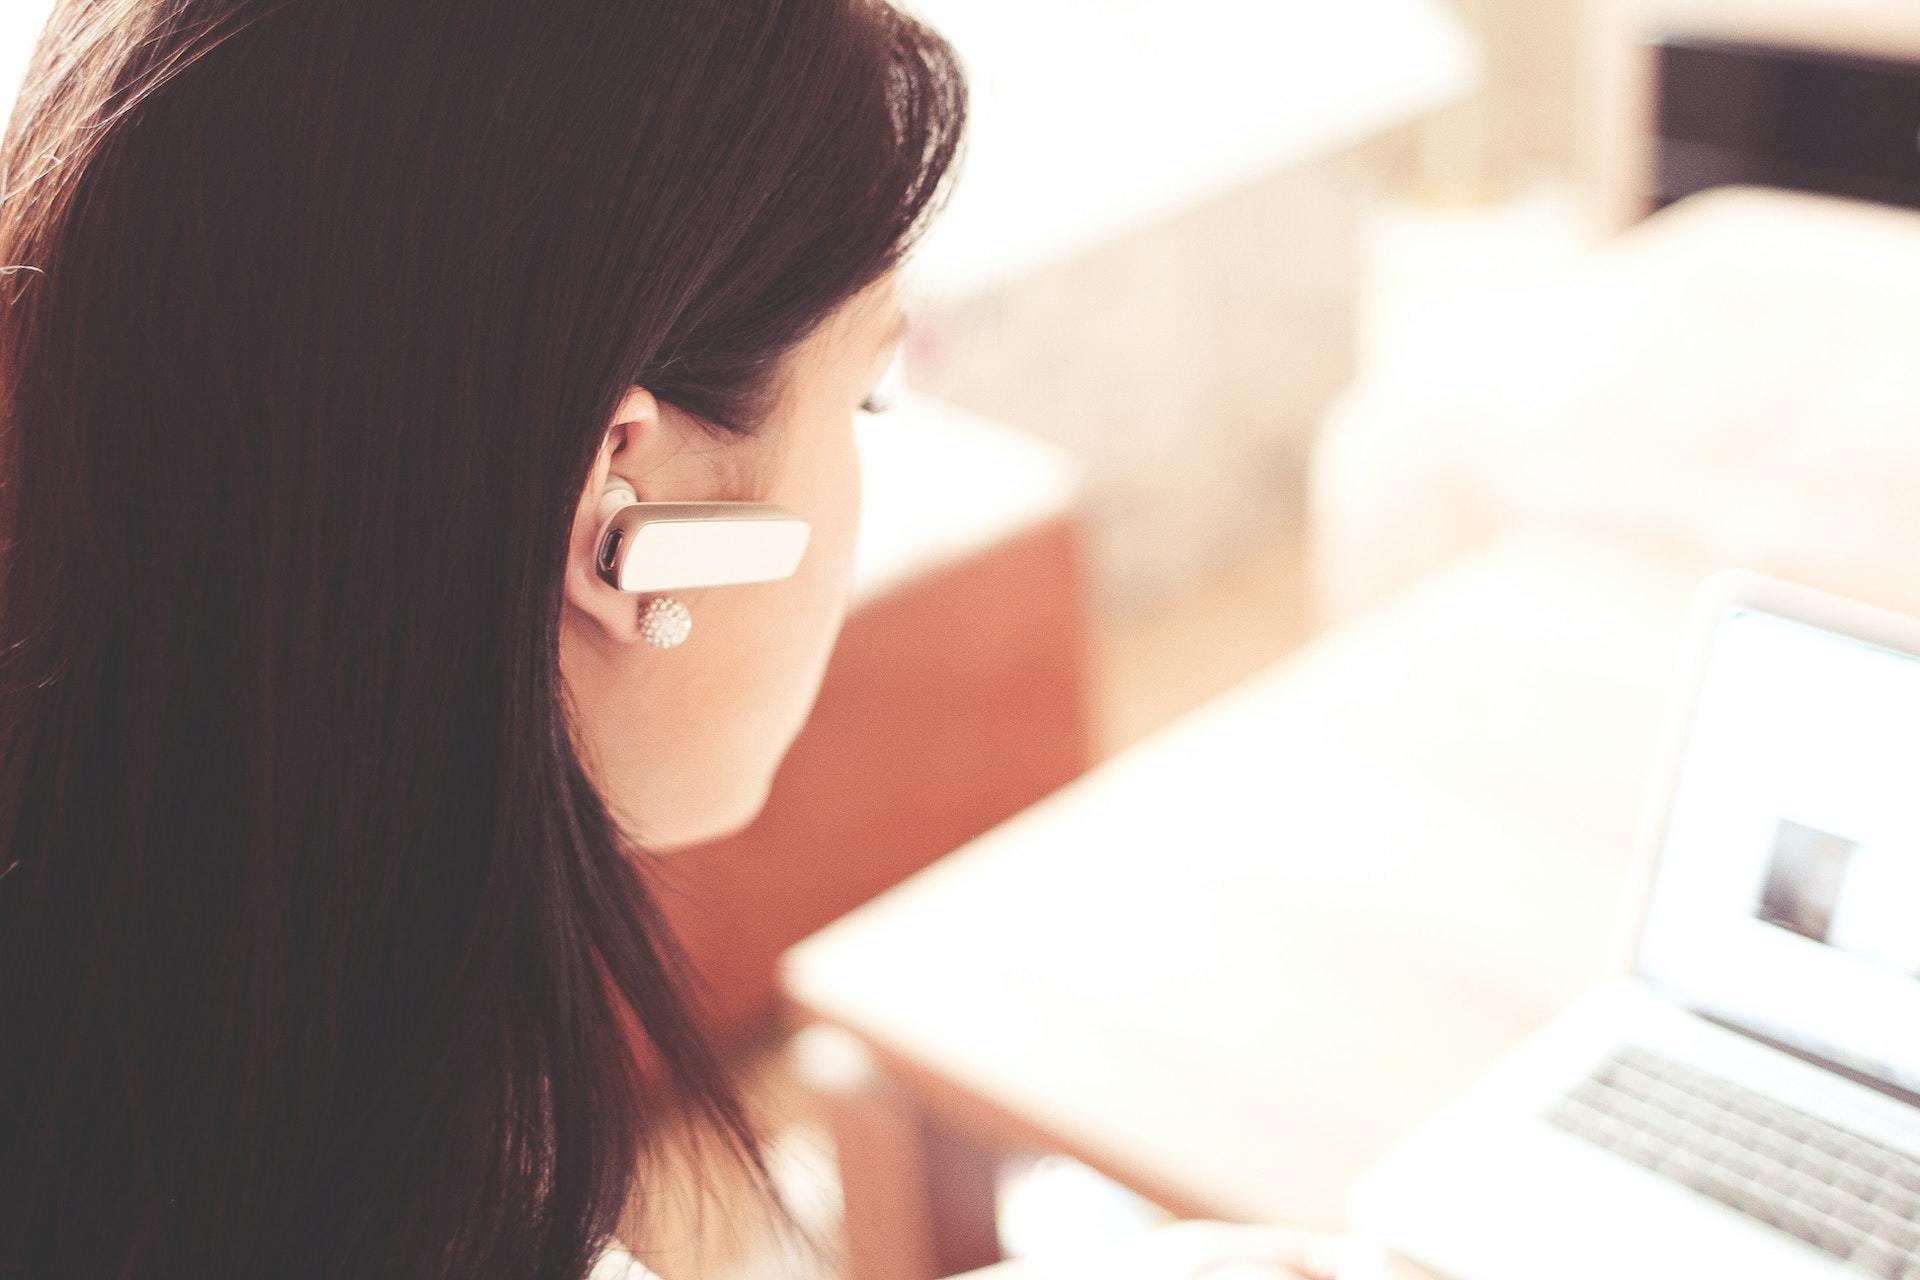 Are you already providing a VBM service for your VA clients